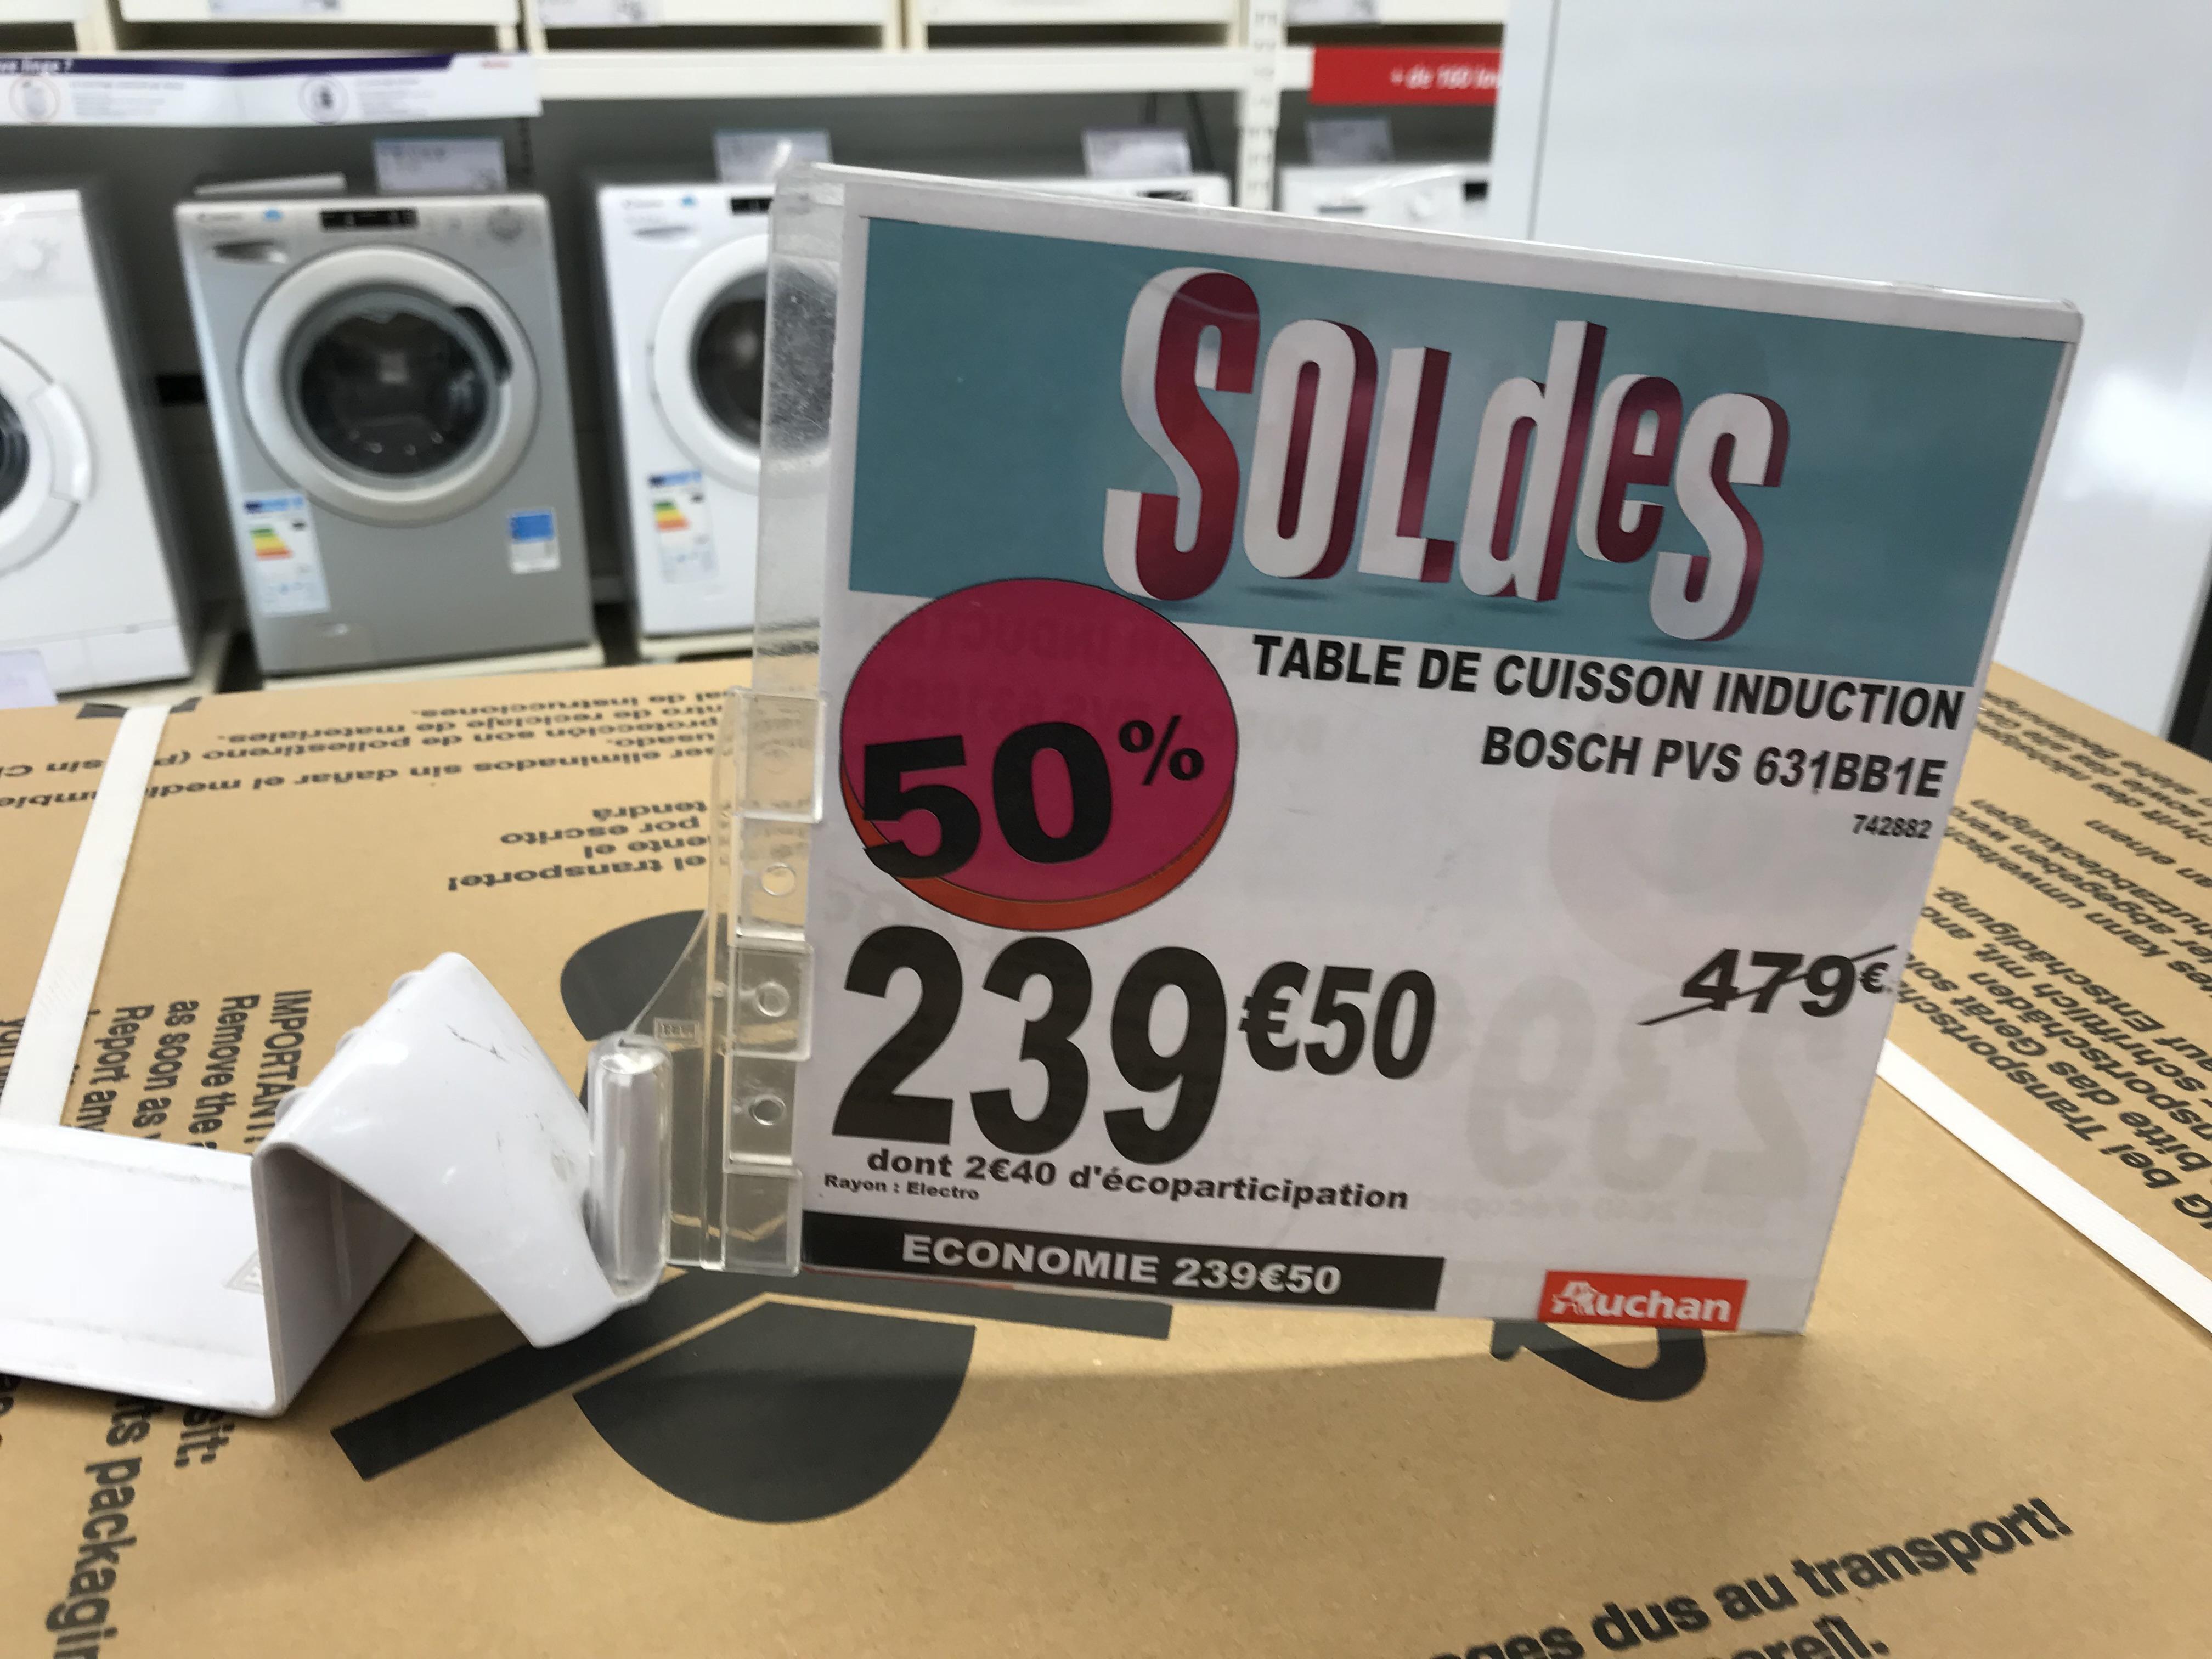 table de cuisson induction bosch PVS 631BB1E - Auchan Dardilly(69)